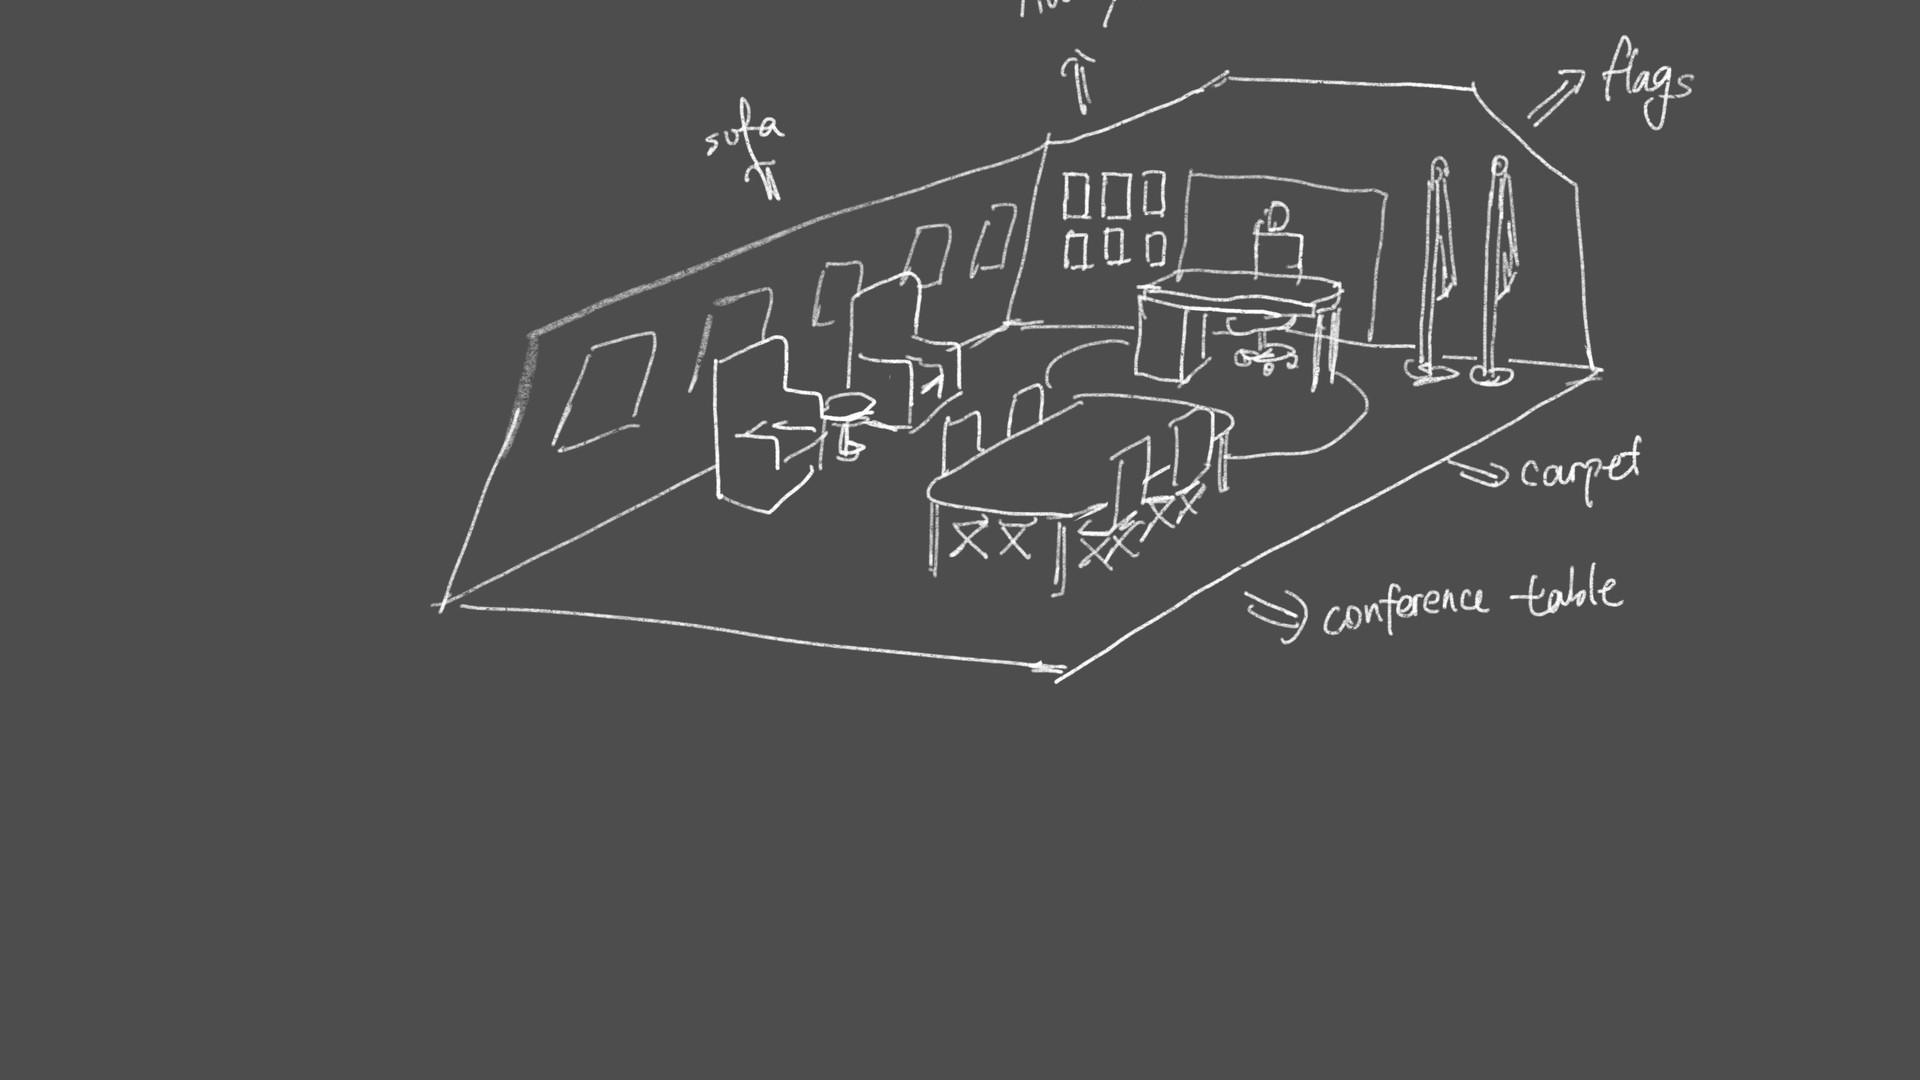 Scenic Sketches